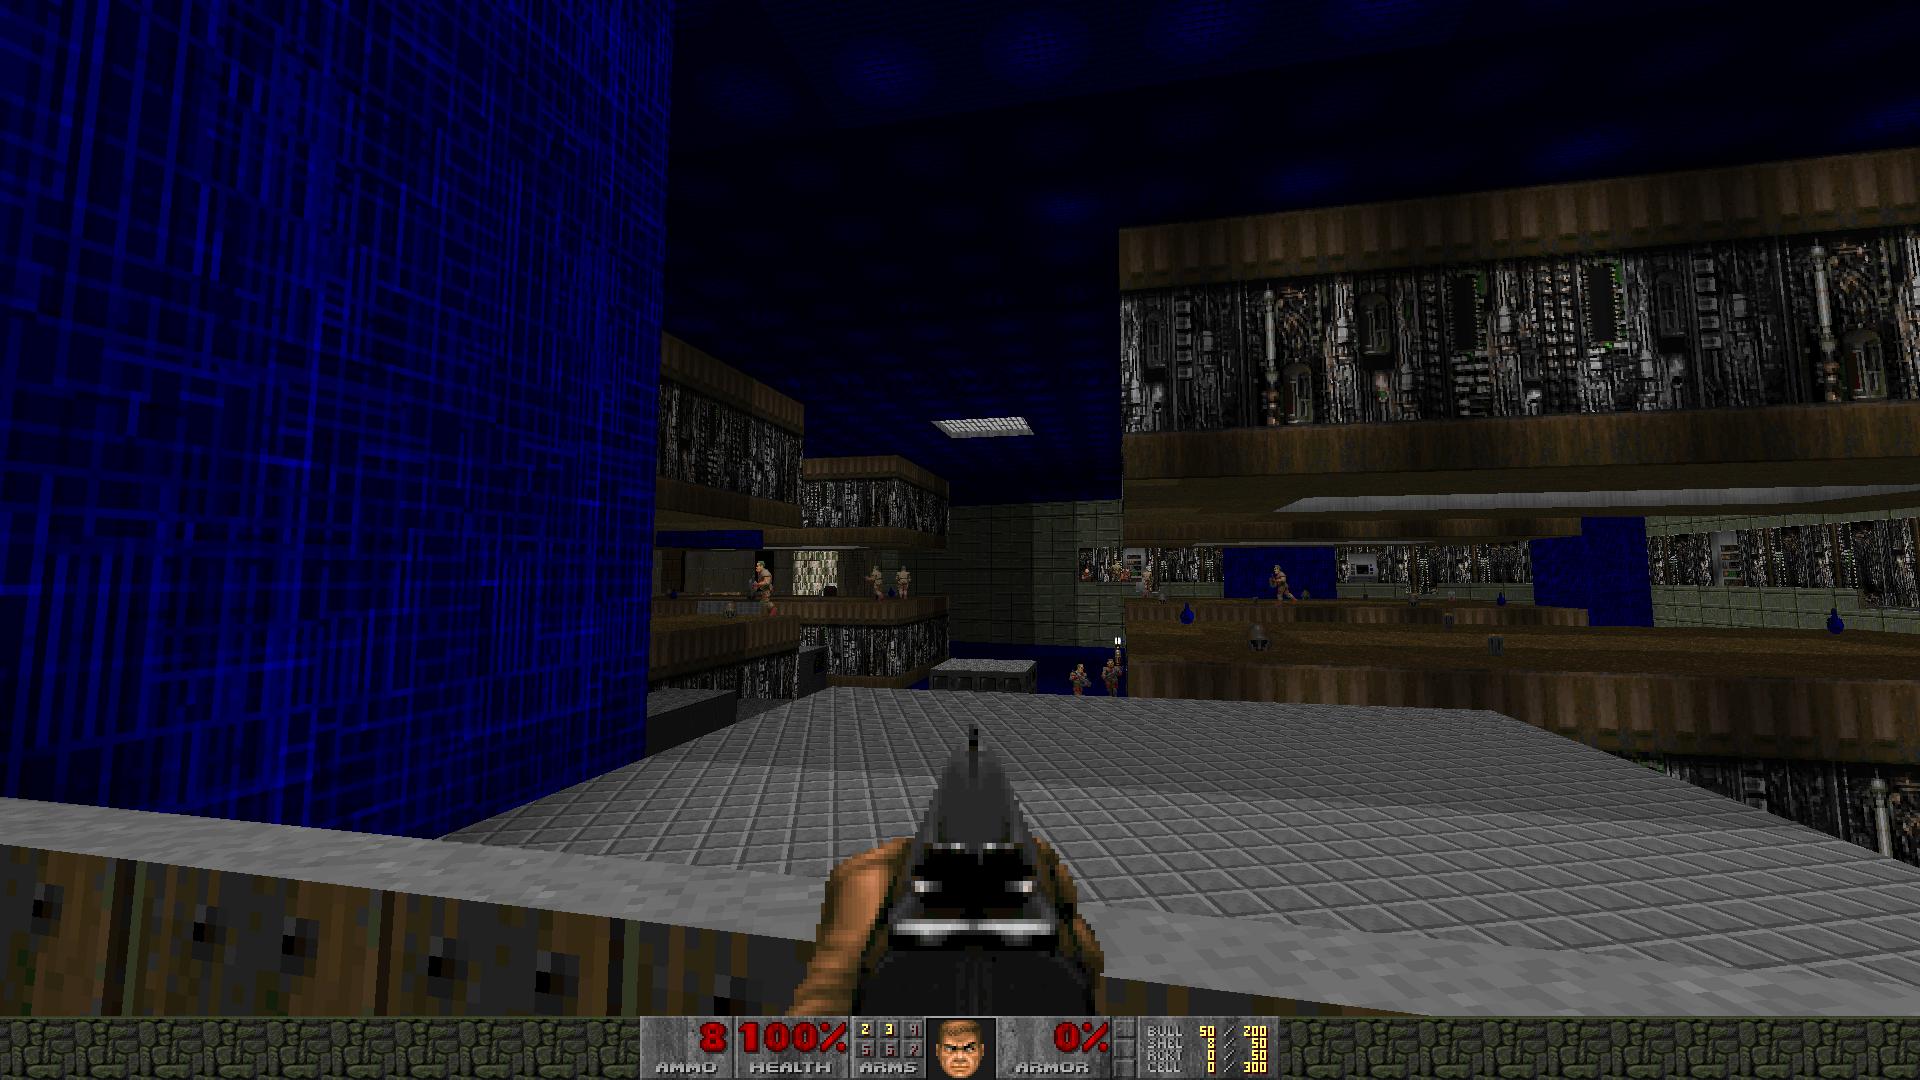 Reactor Core 2